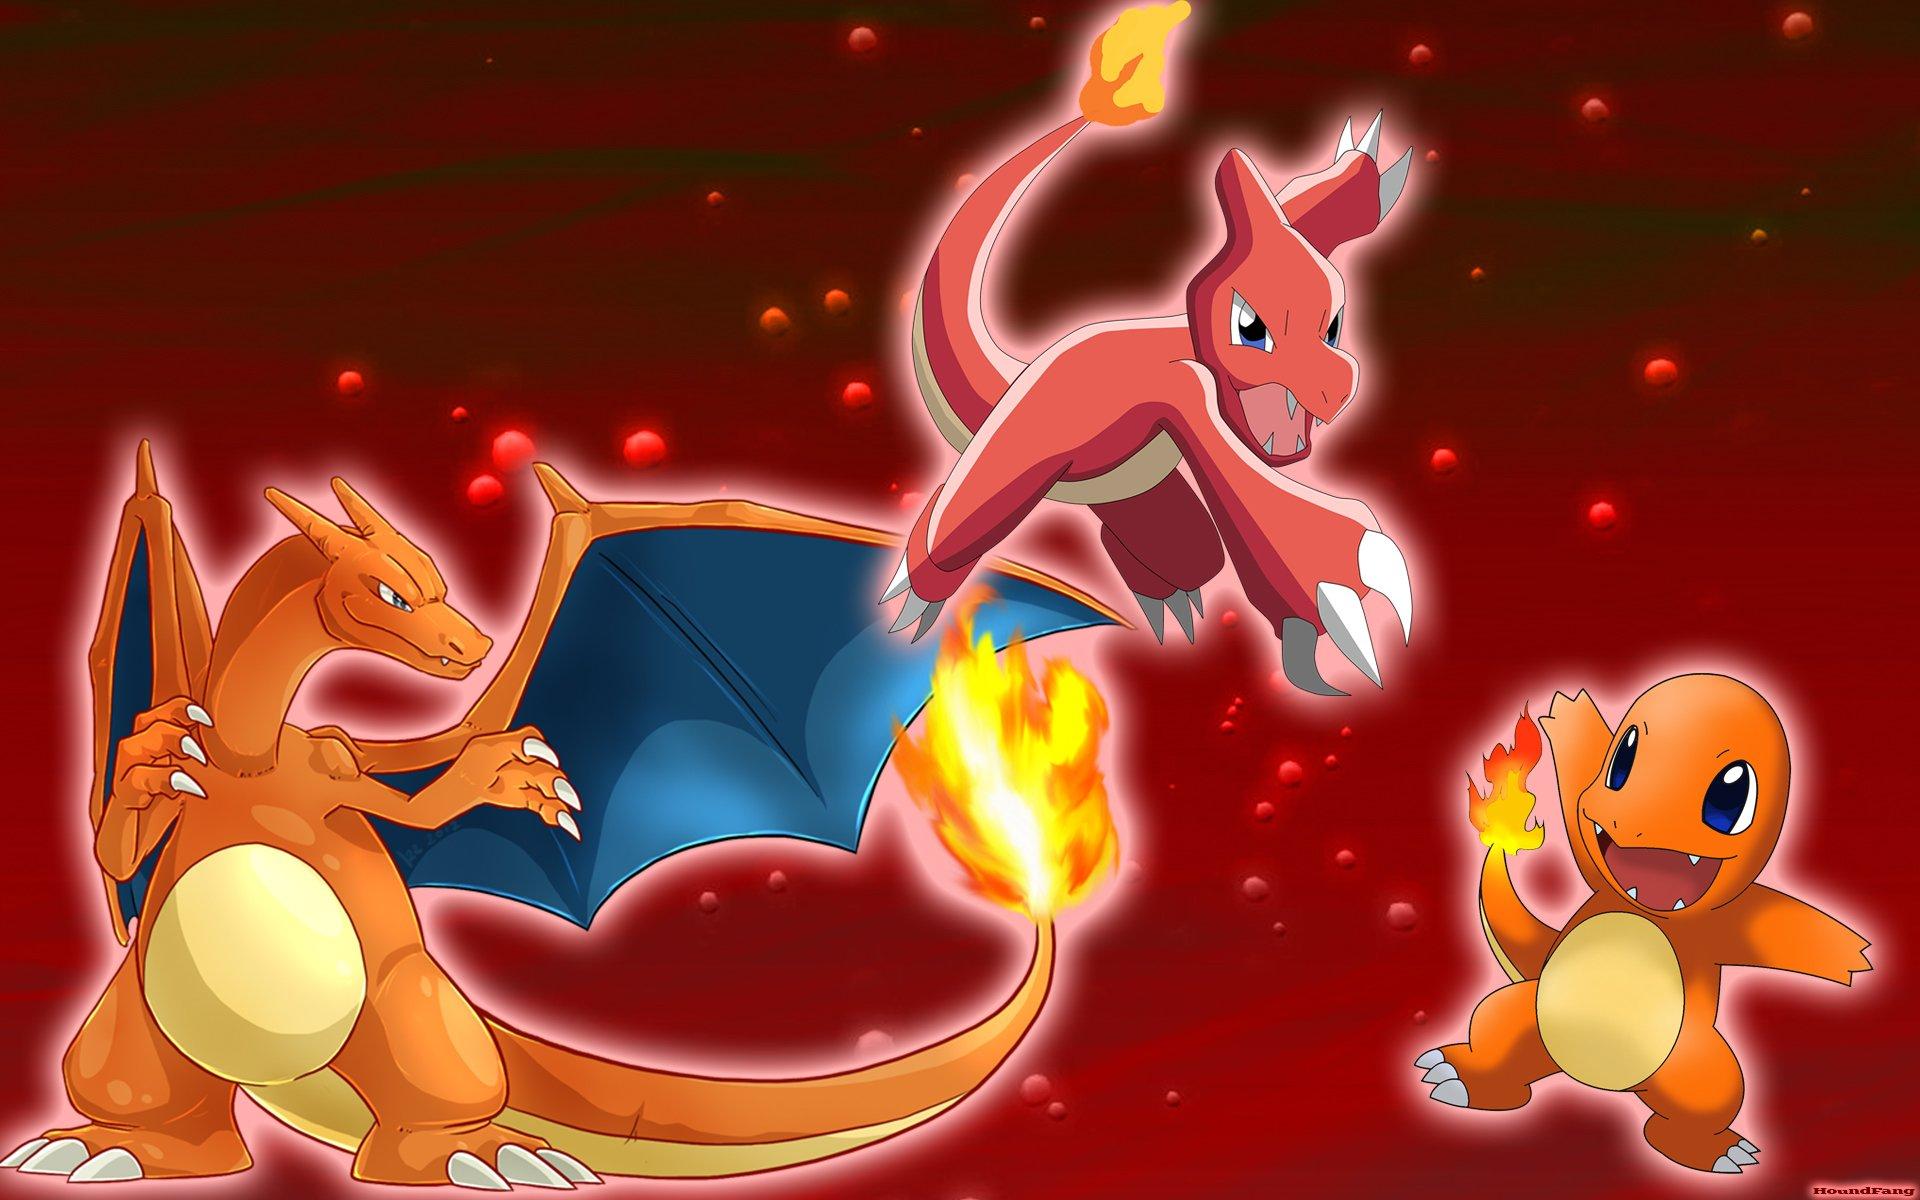 Pokemon Fire Red Wallpaper - WallpaperSafari